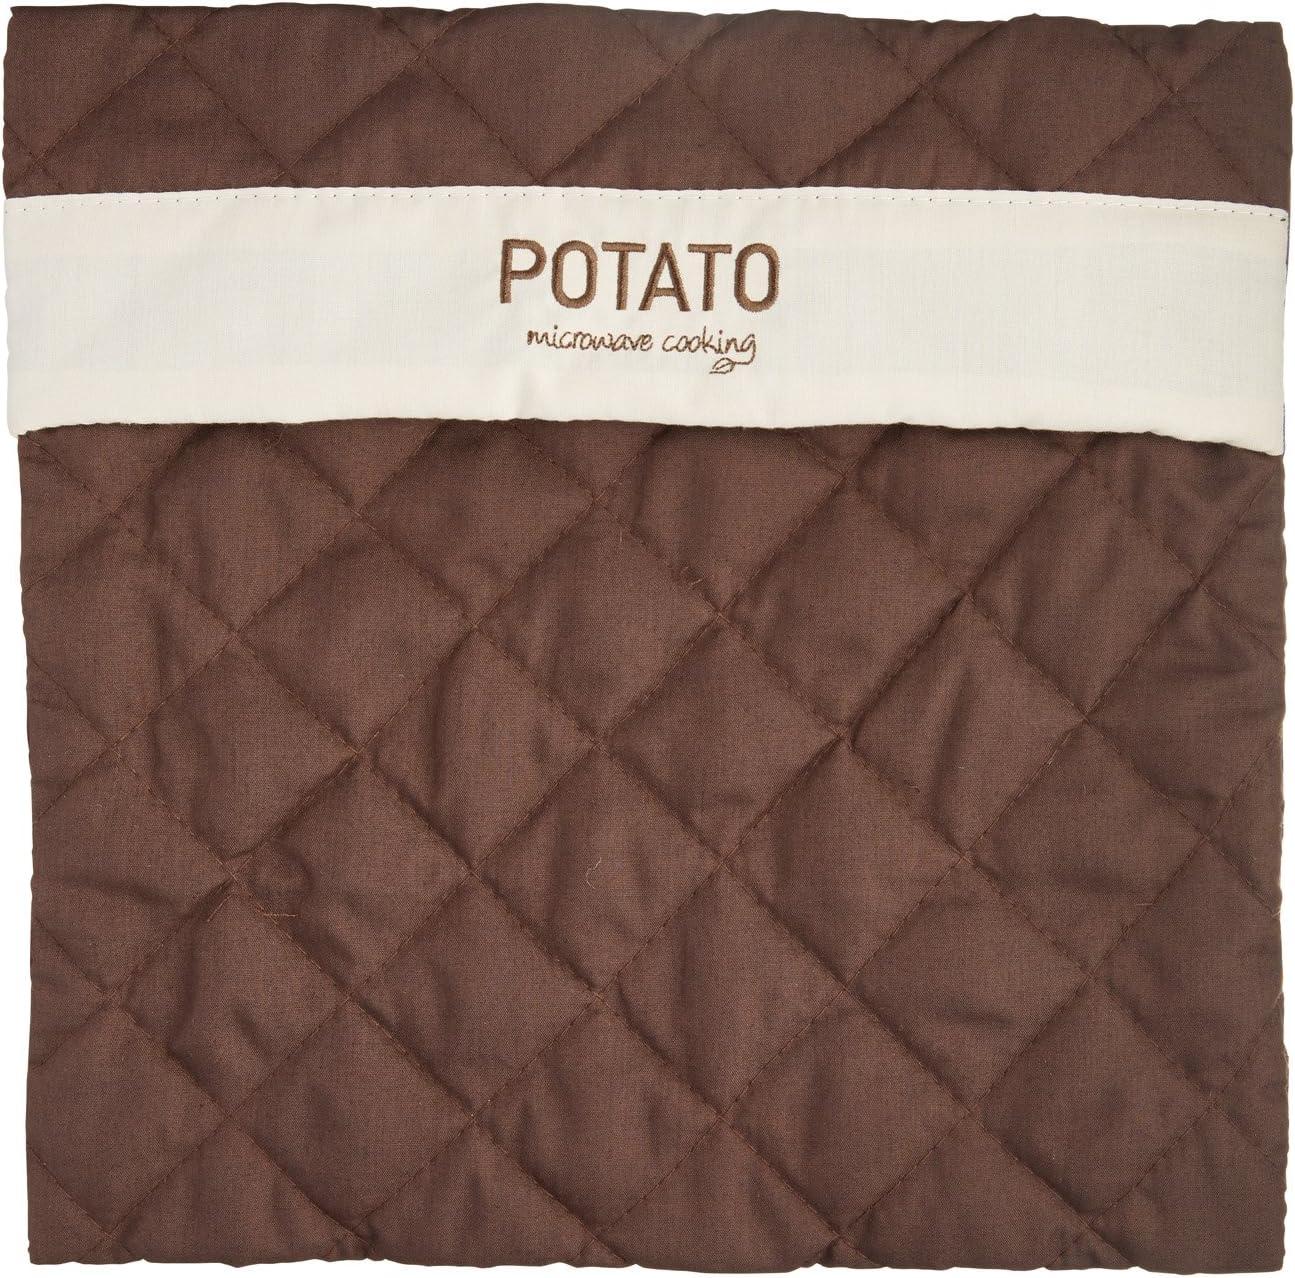 "Kitchencraft Microwave Cooking Potato Baker Bag, 28 x 28cm (11"" x 11"") - Brown"